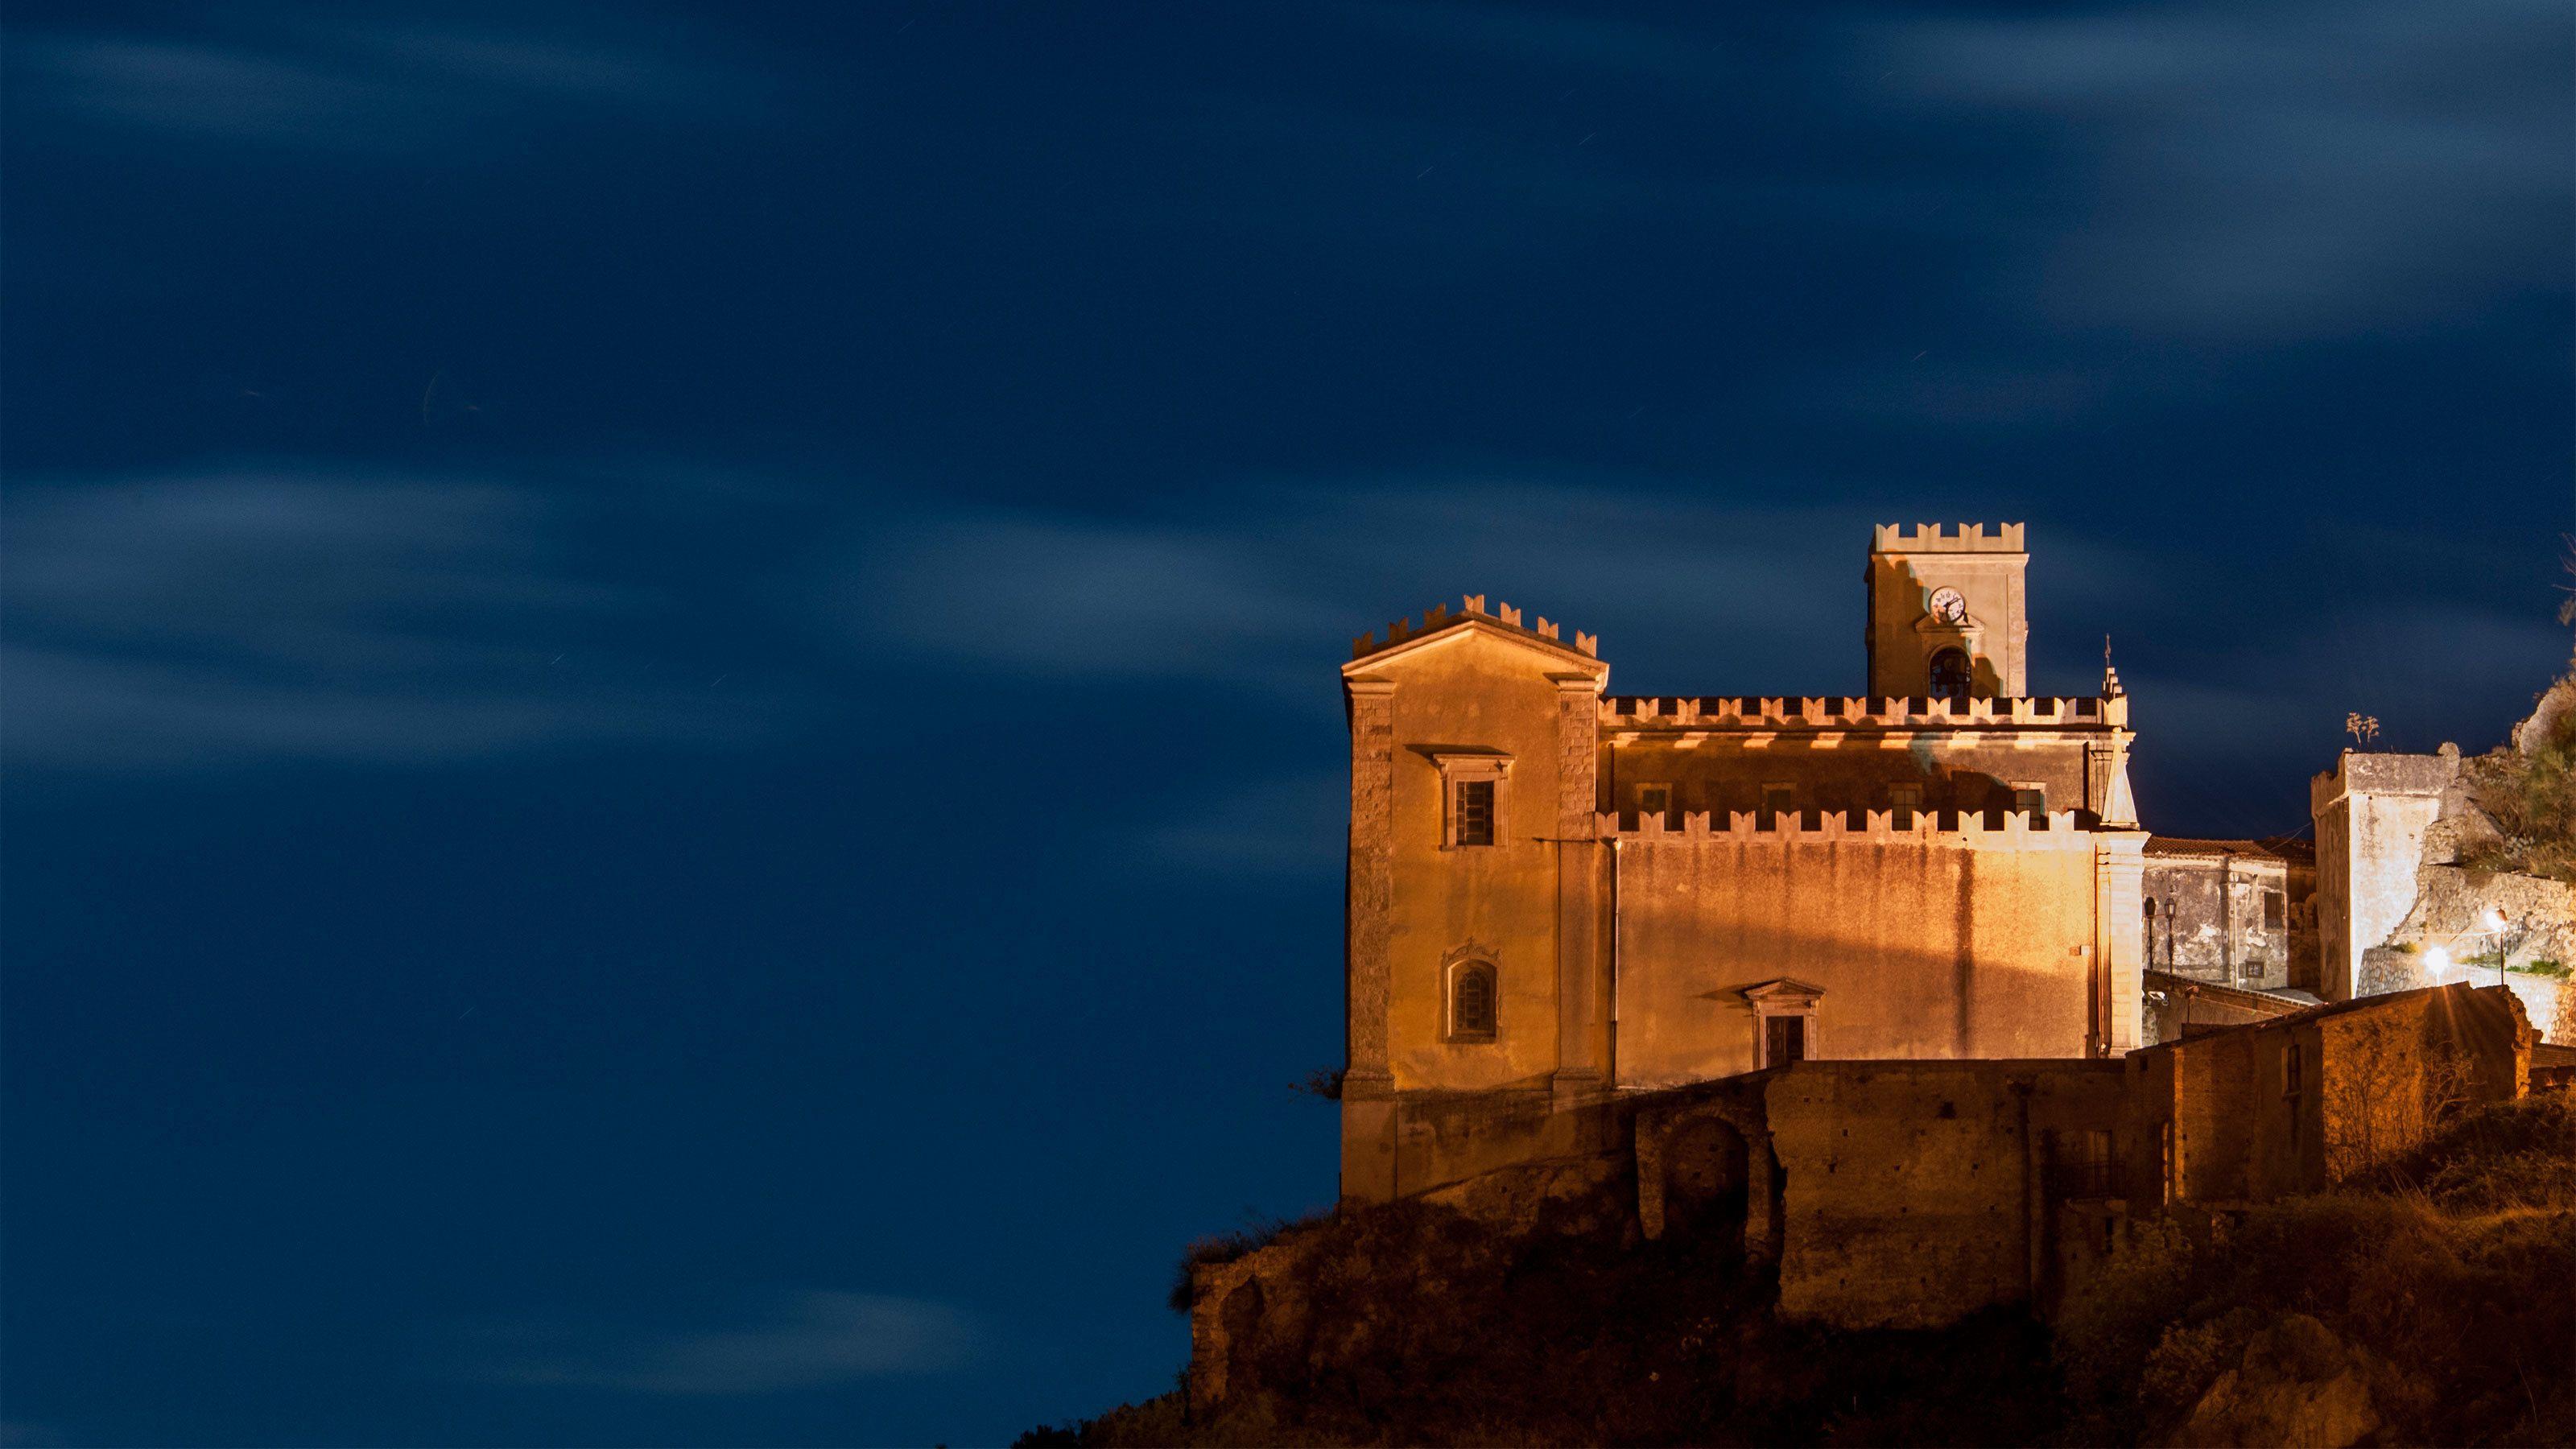 Cliffside castle at night in Taormina